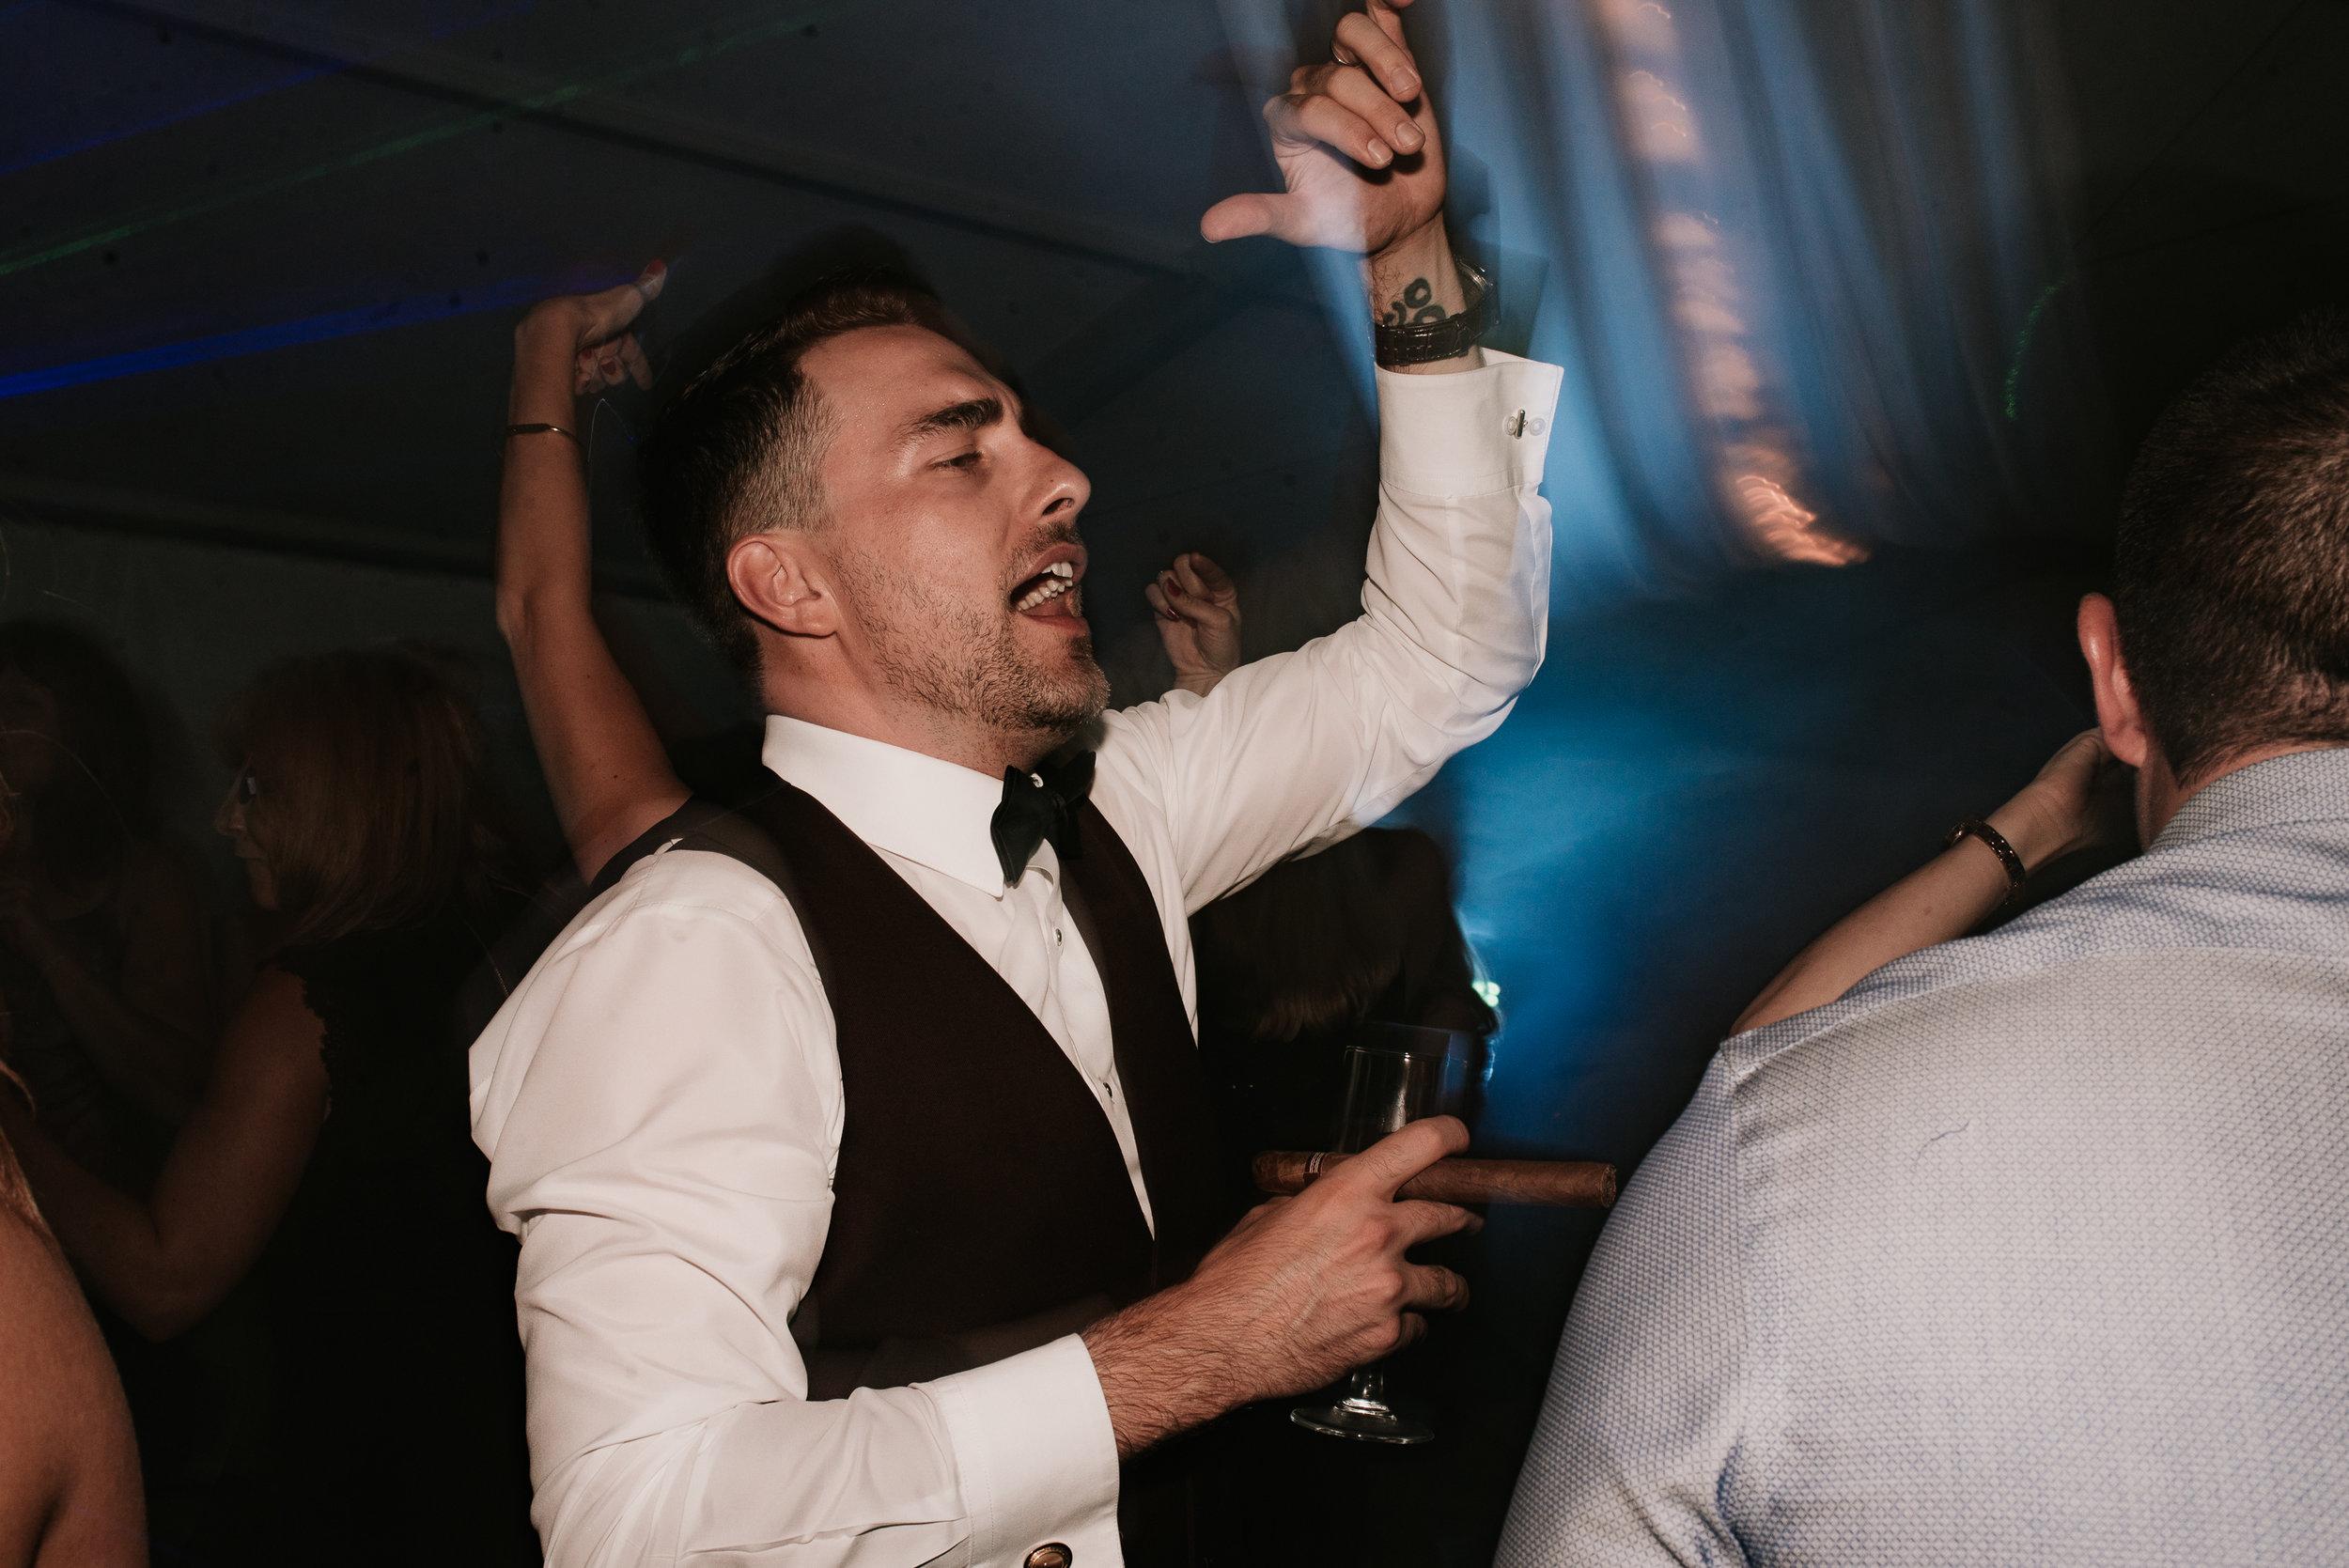 Claremont_fourseasons_Wedding-541.jpg